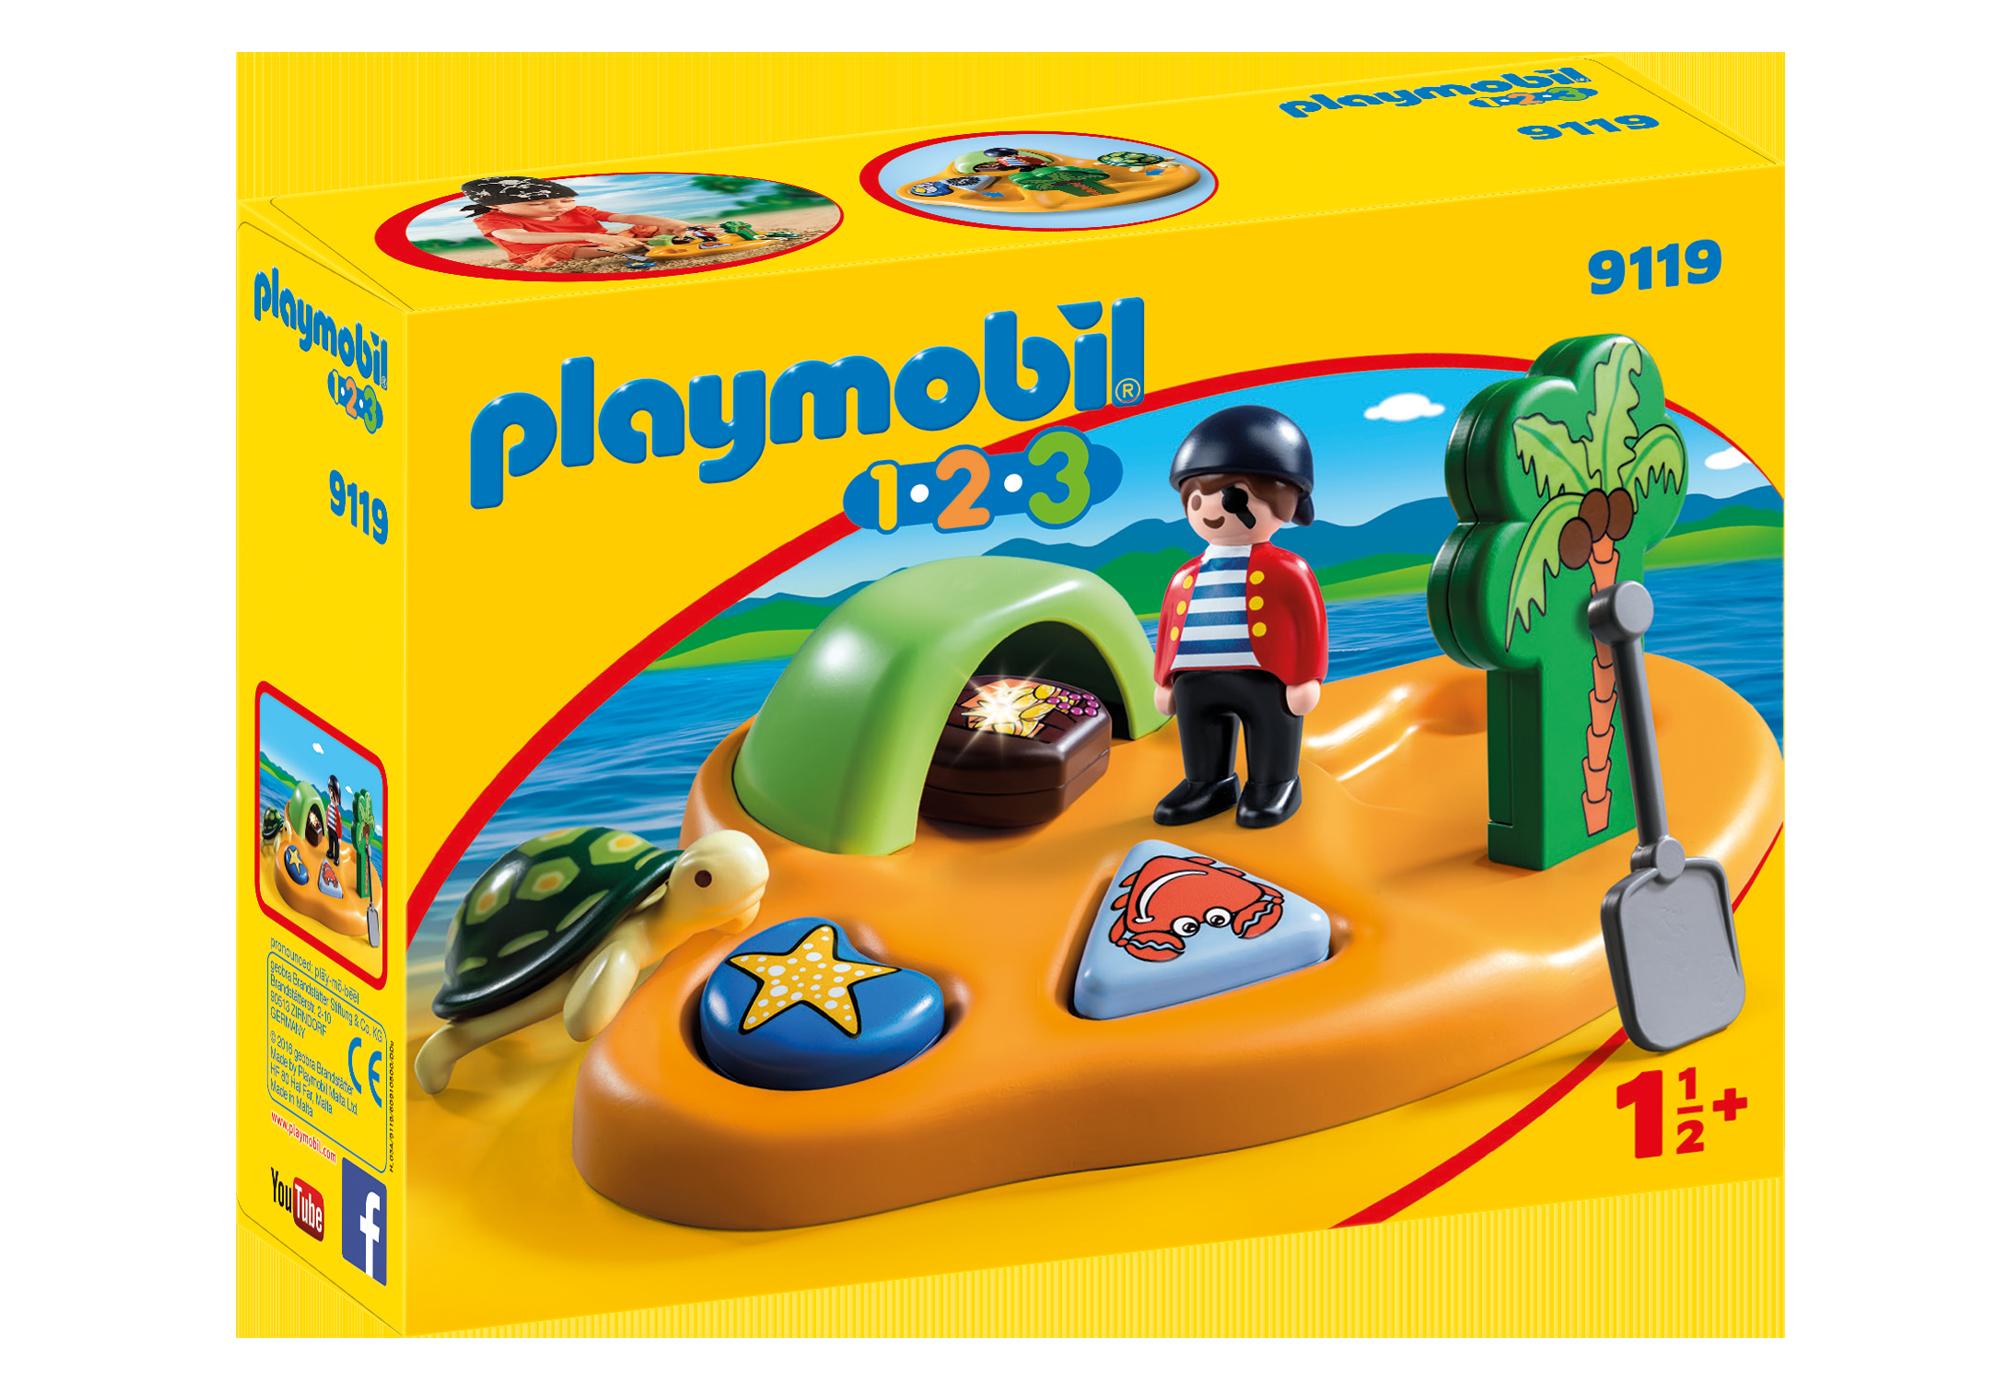 http://media.playmobil.com/i/playmobil/9119_product_box_front/Pirate Island